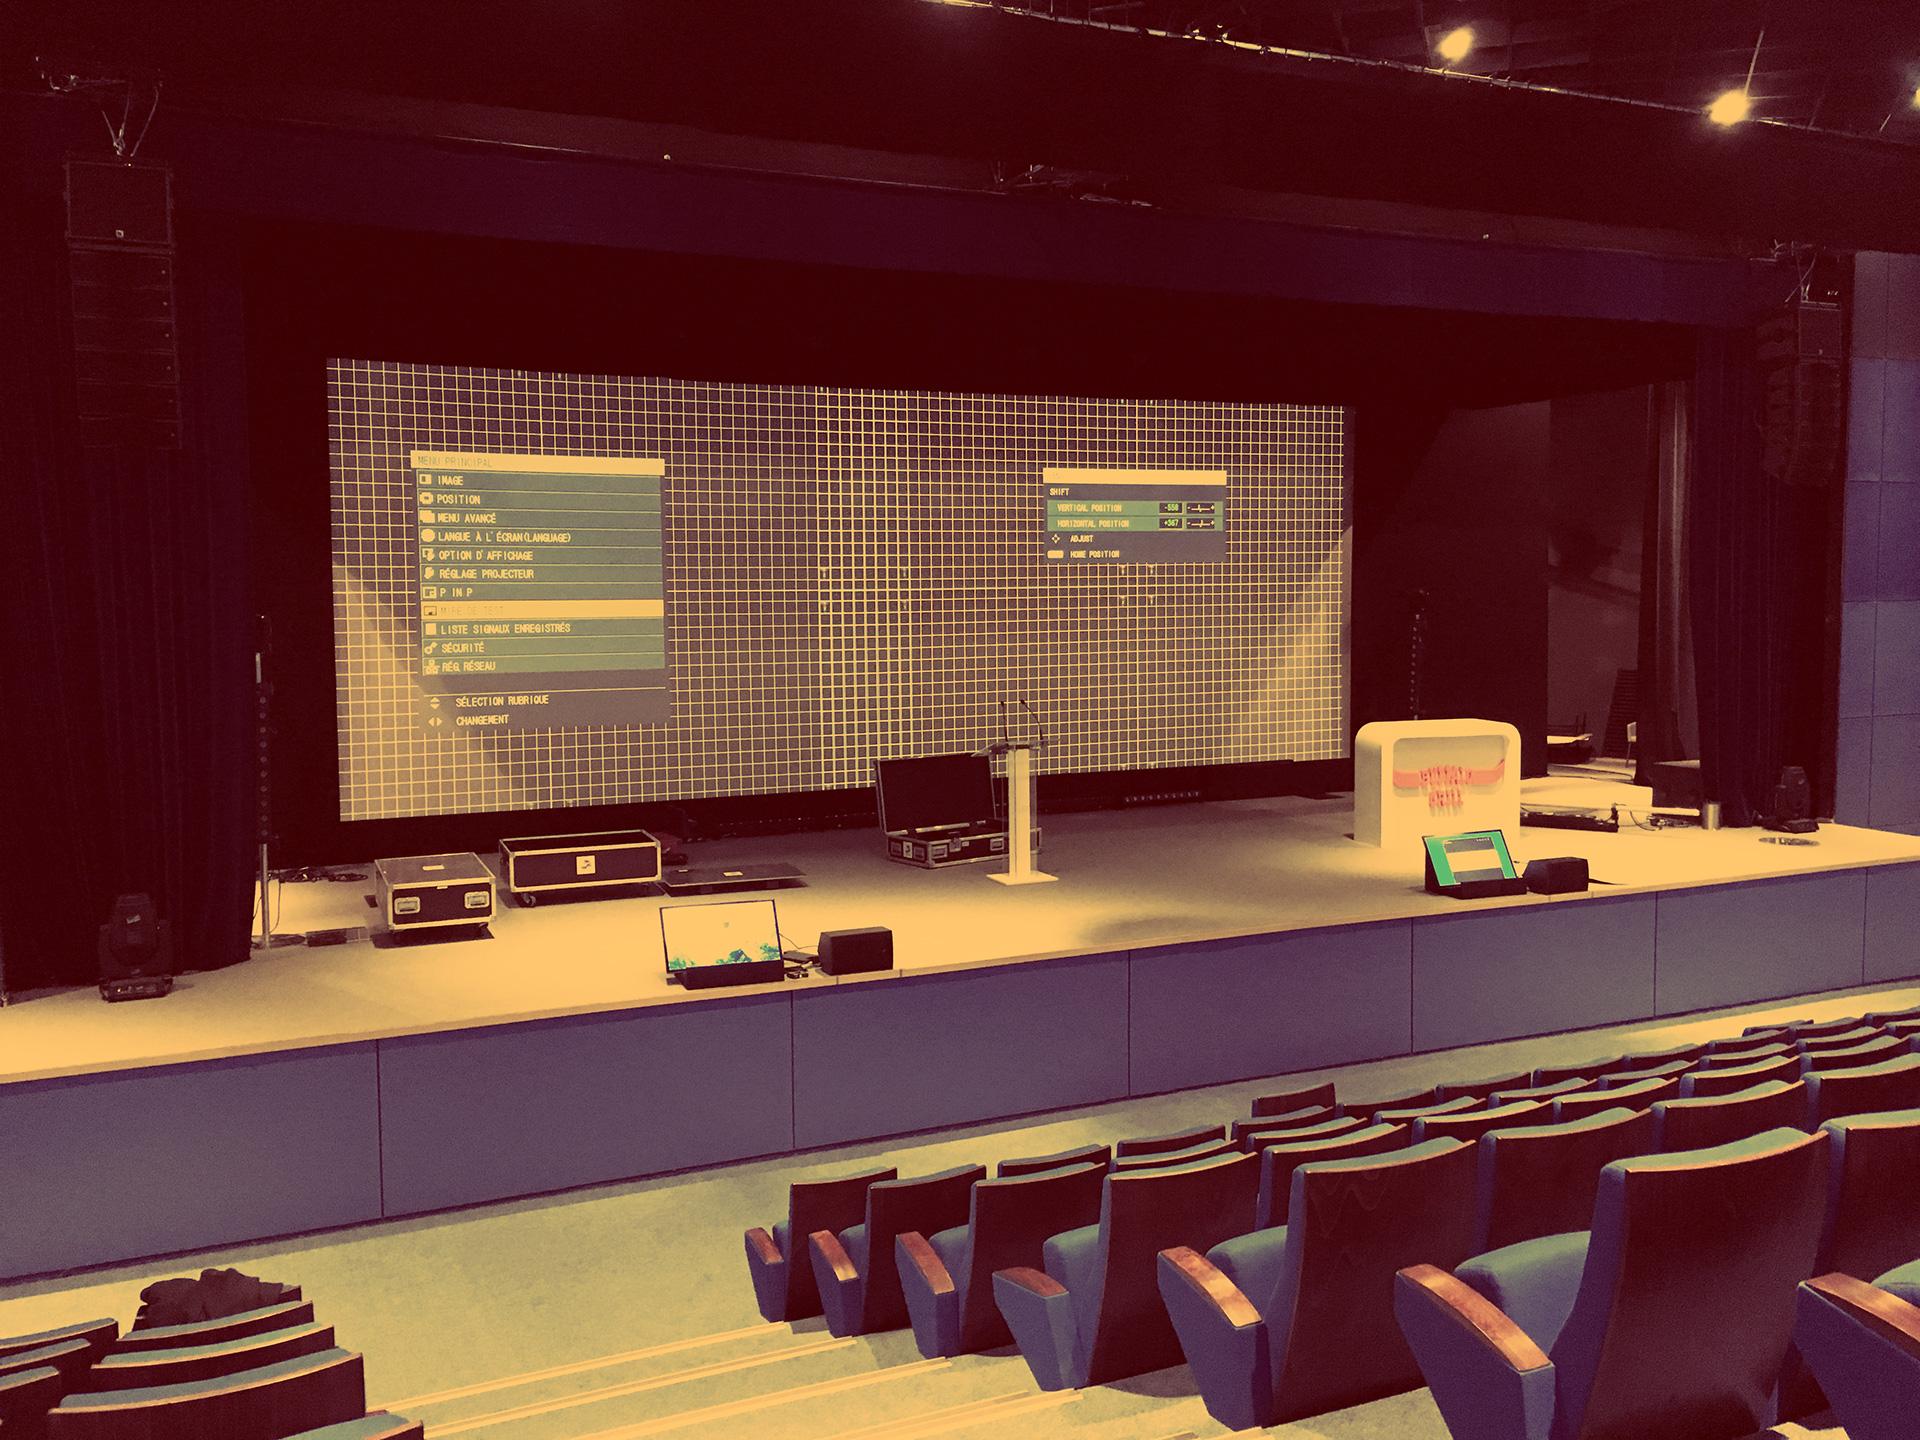 Convention, Centre de congrès Juan les Pins